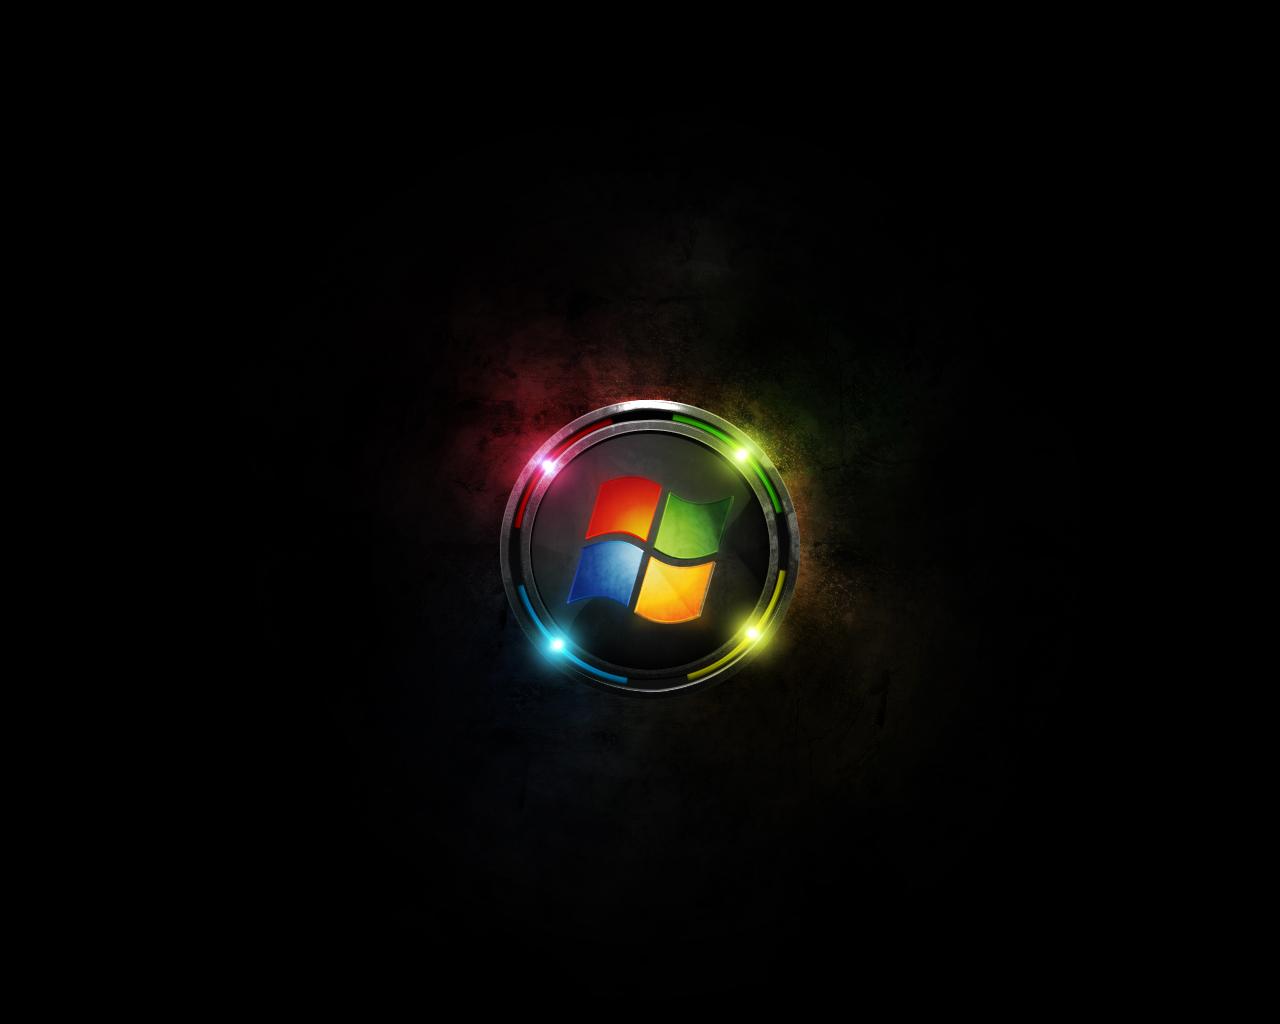 Windows 7 Background Black